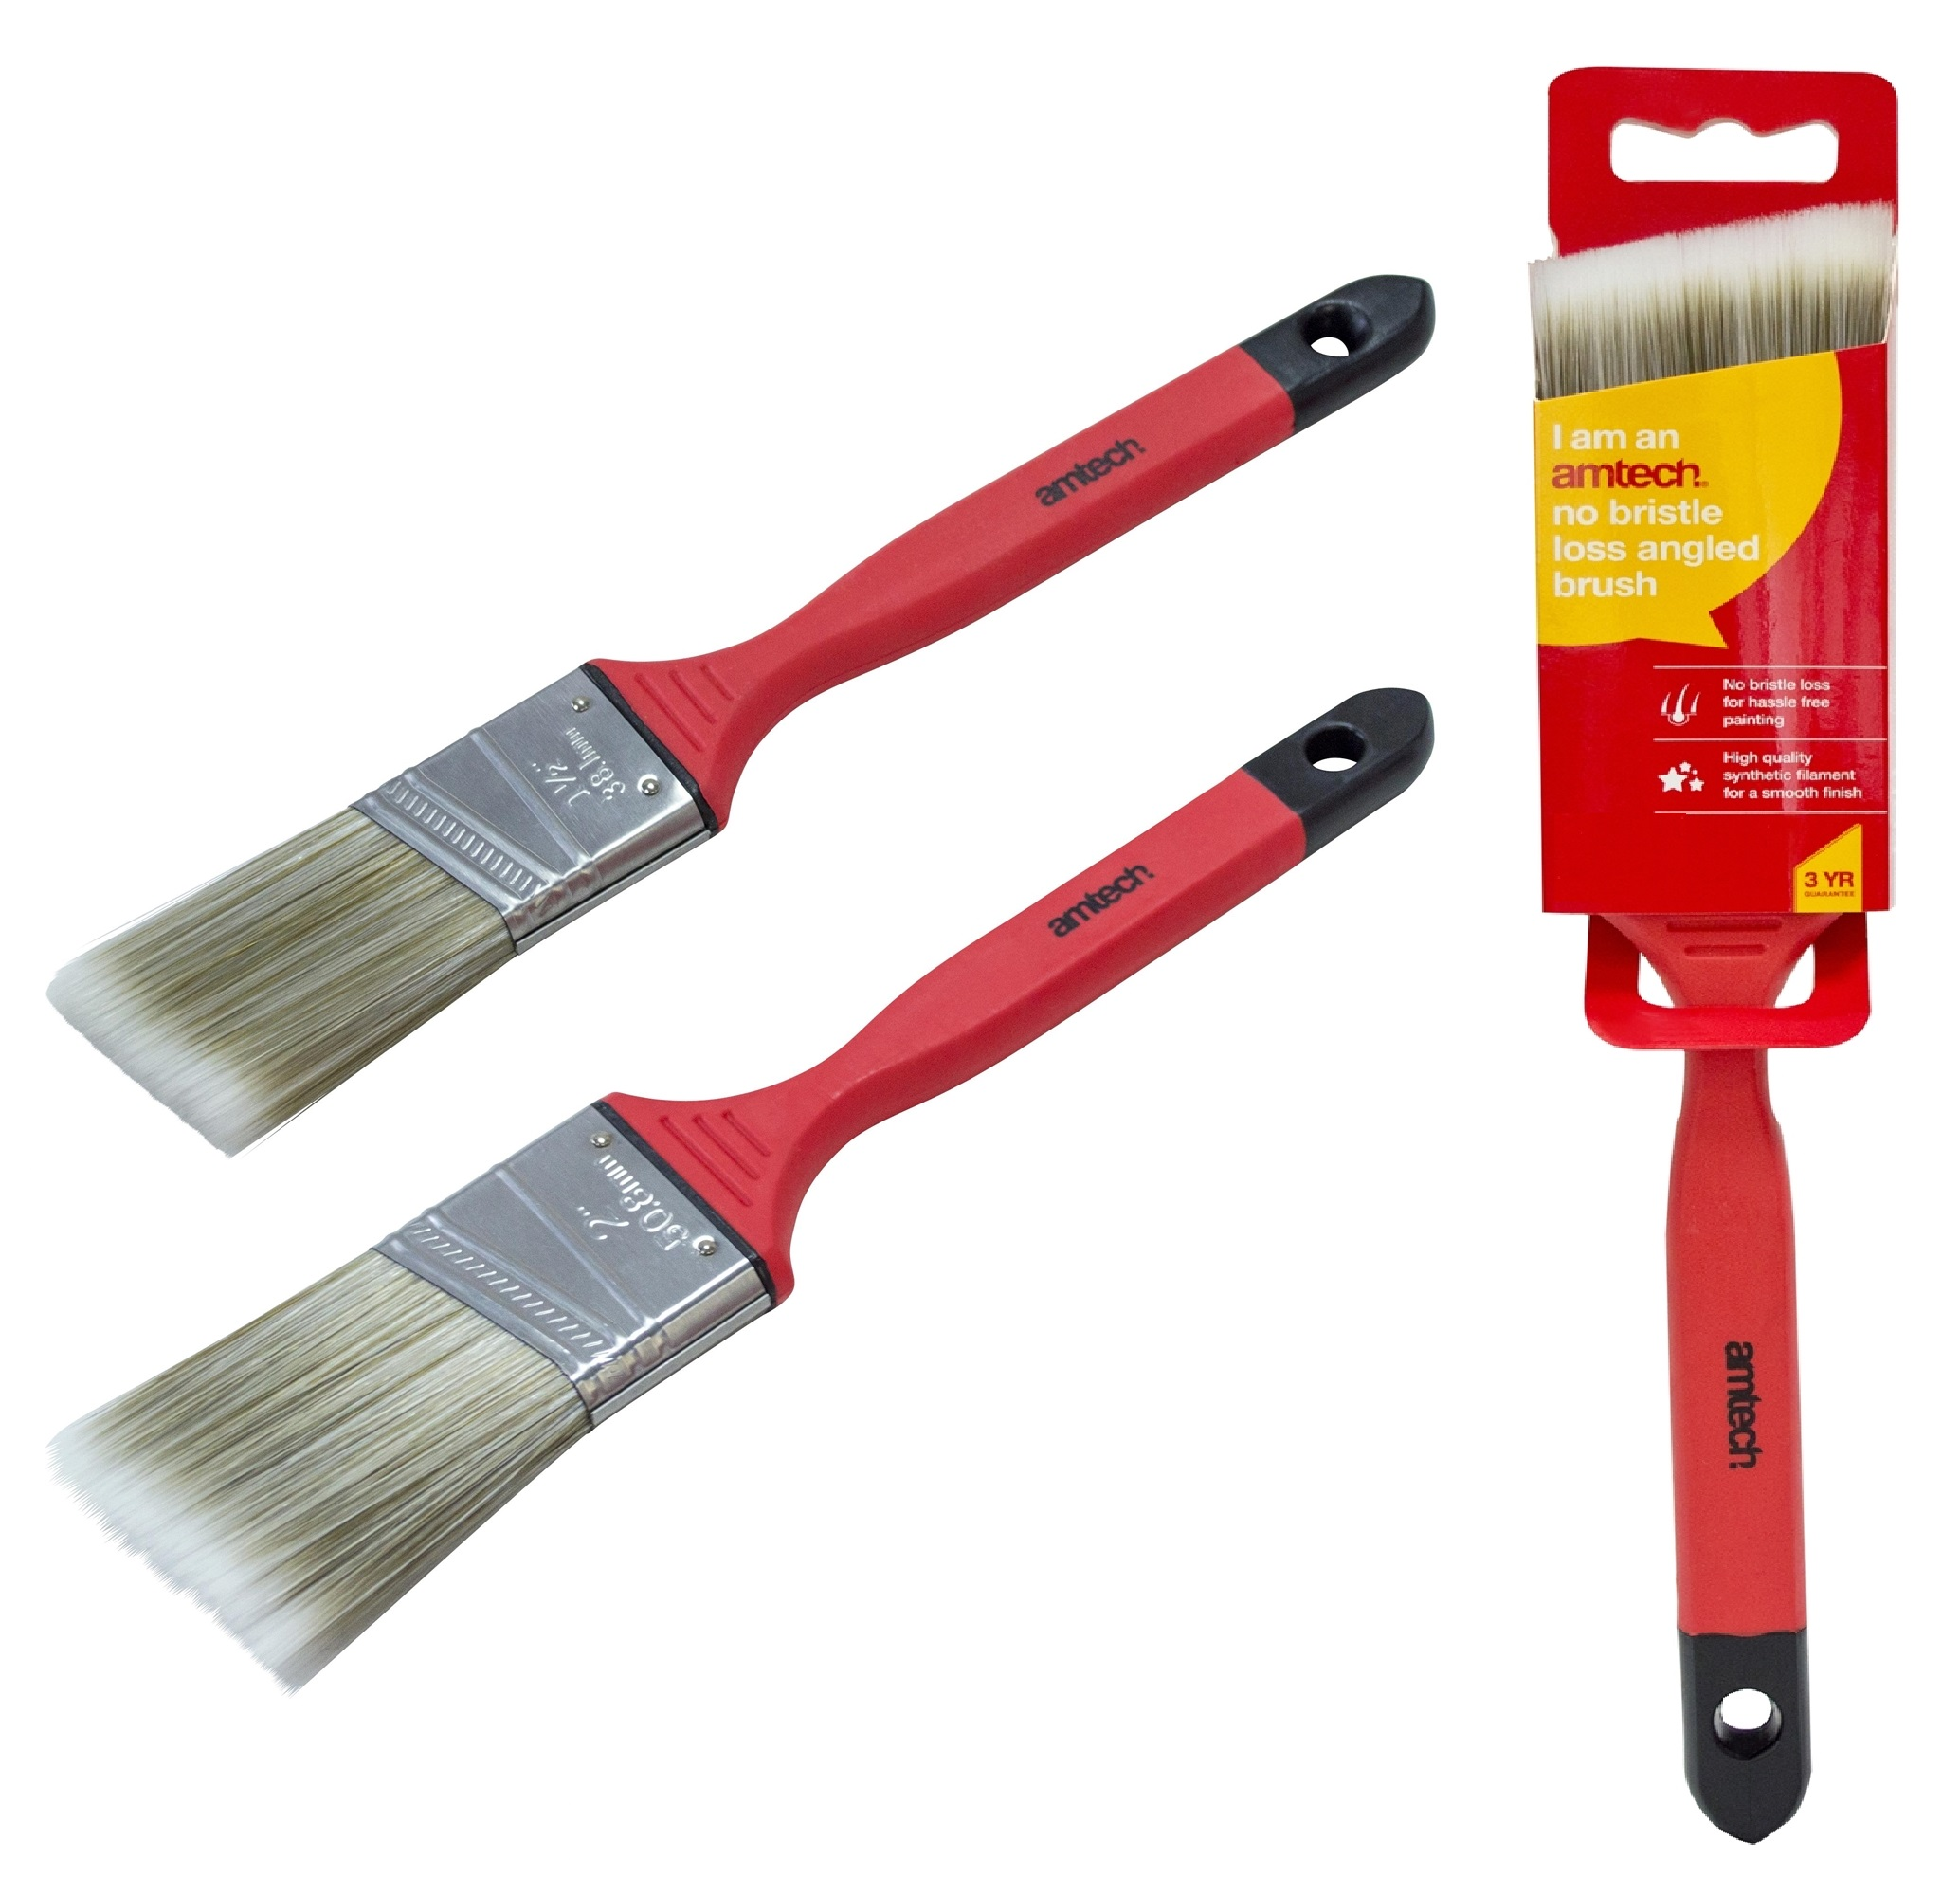 "2 Paint Brushes Set Soft Handle 50mm 2/"" No Bristle Loss Angled Brush"